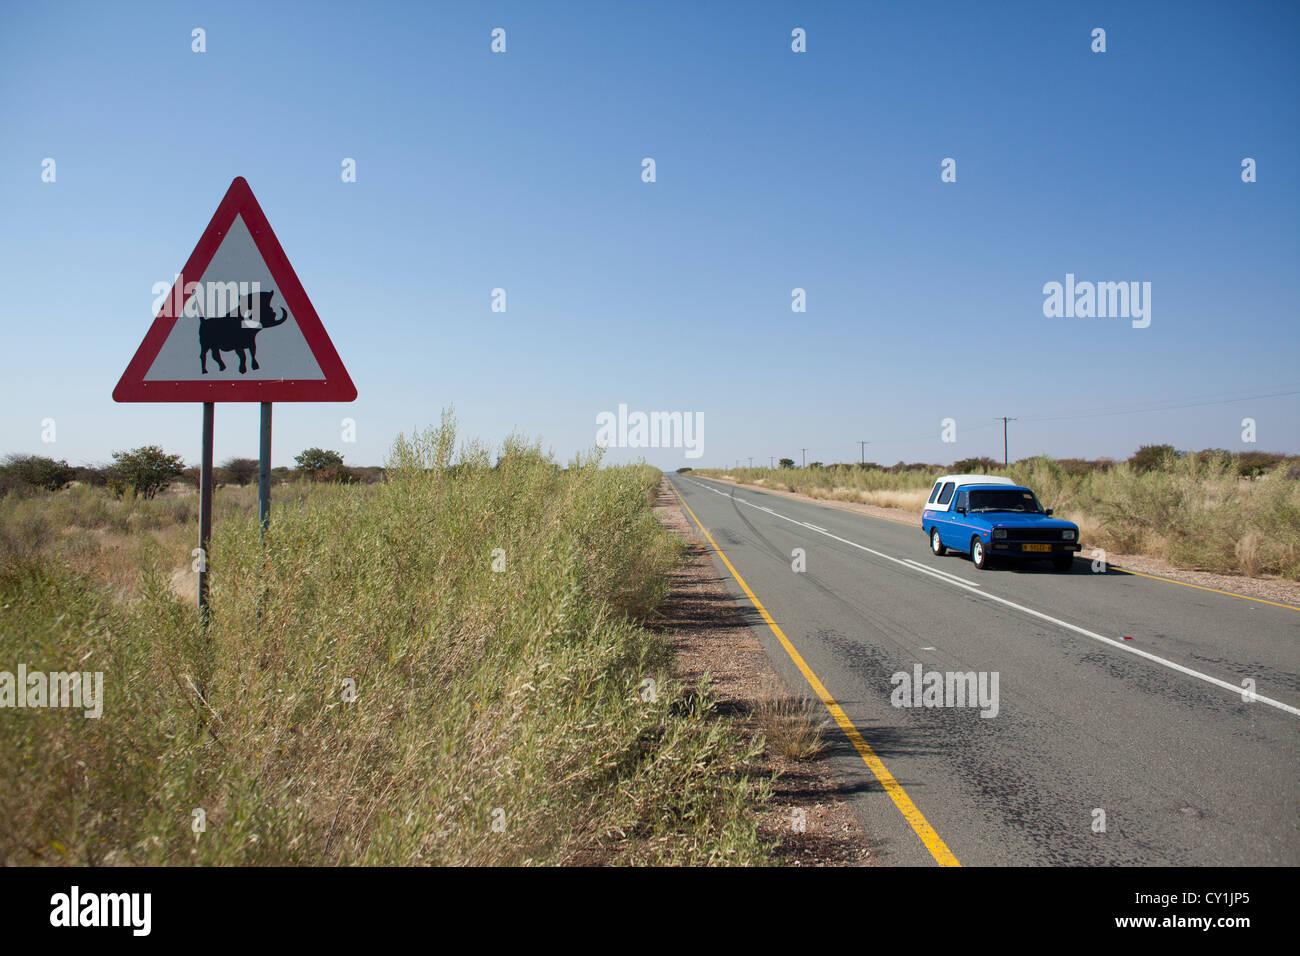 road north of windhoek, namibia - Stock Image